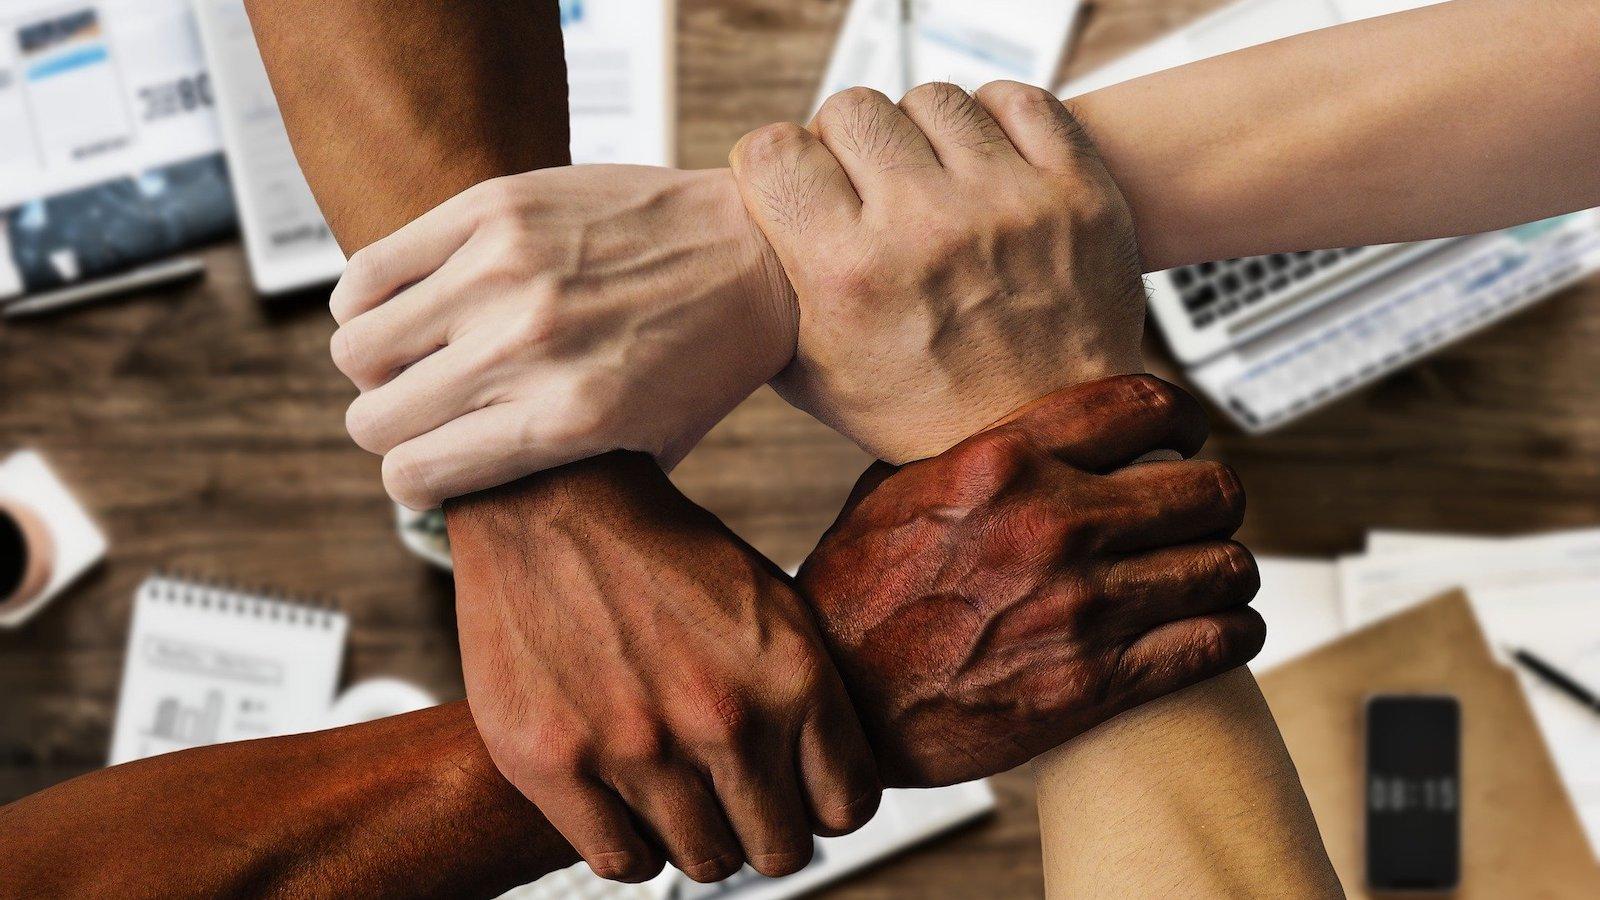 Diversity thrives